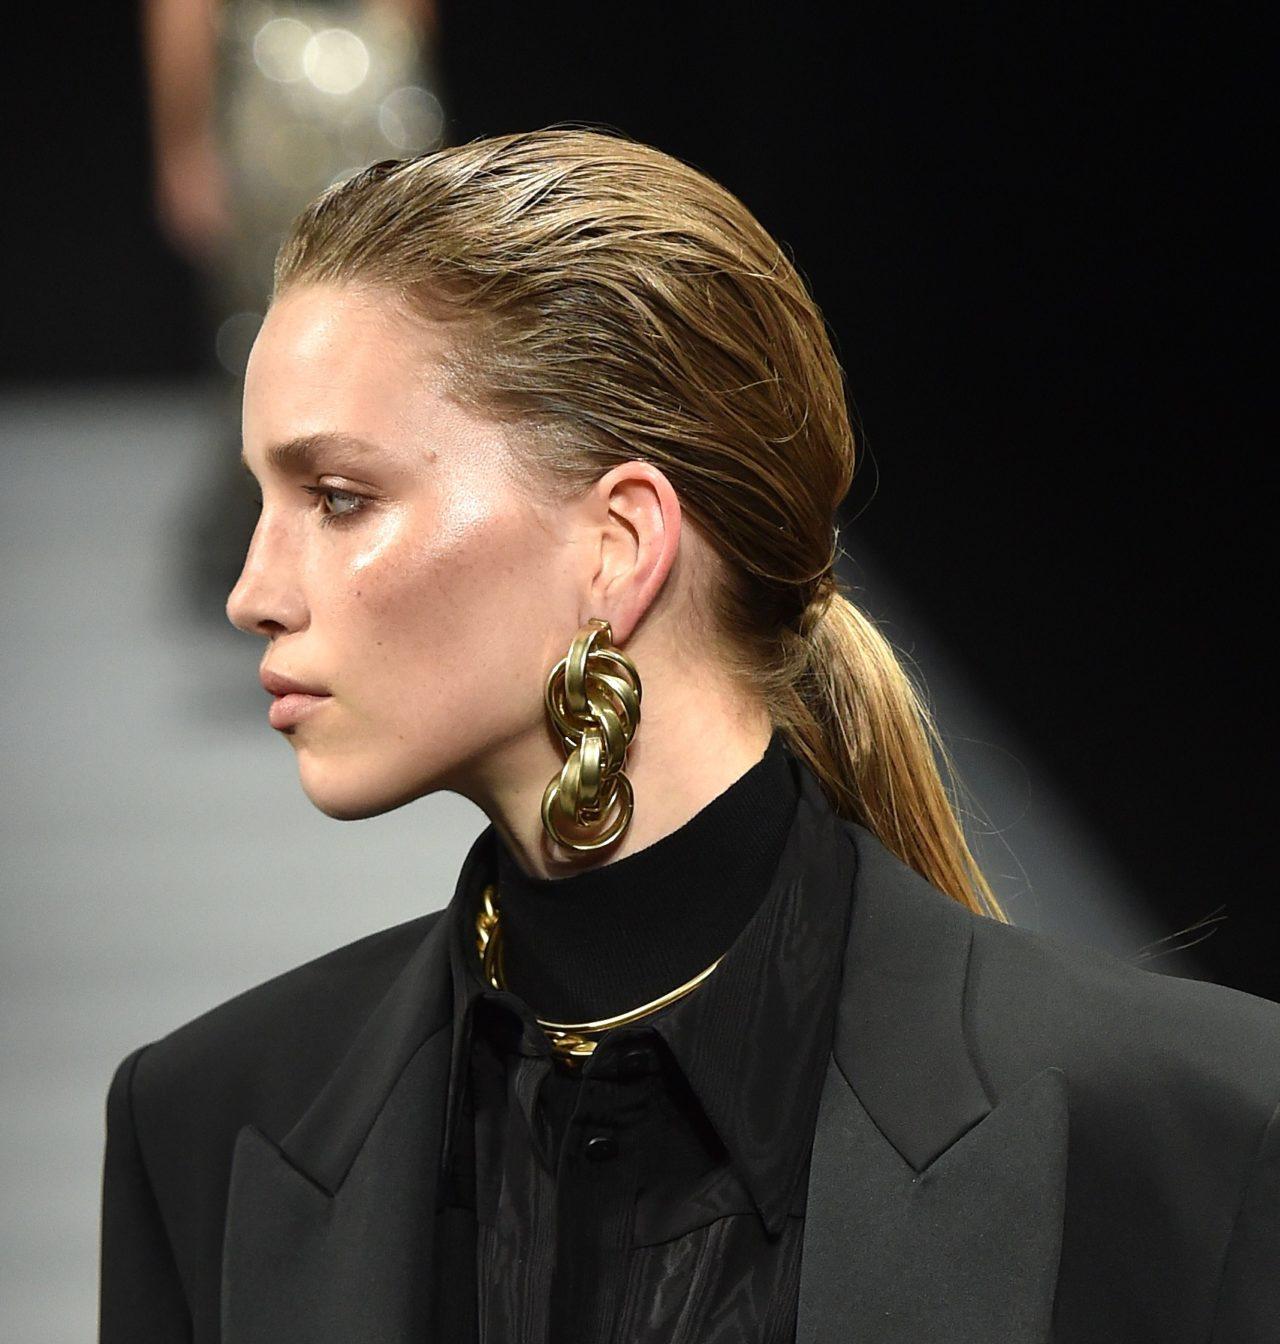 Milan Fashion Week 2020: the main beauty trends